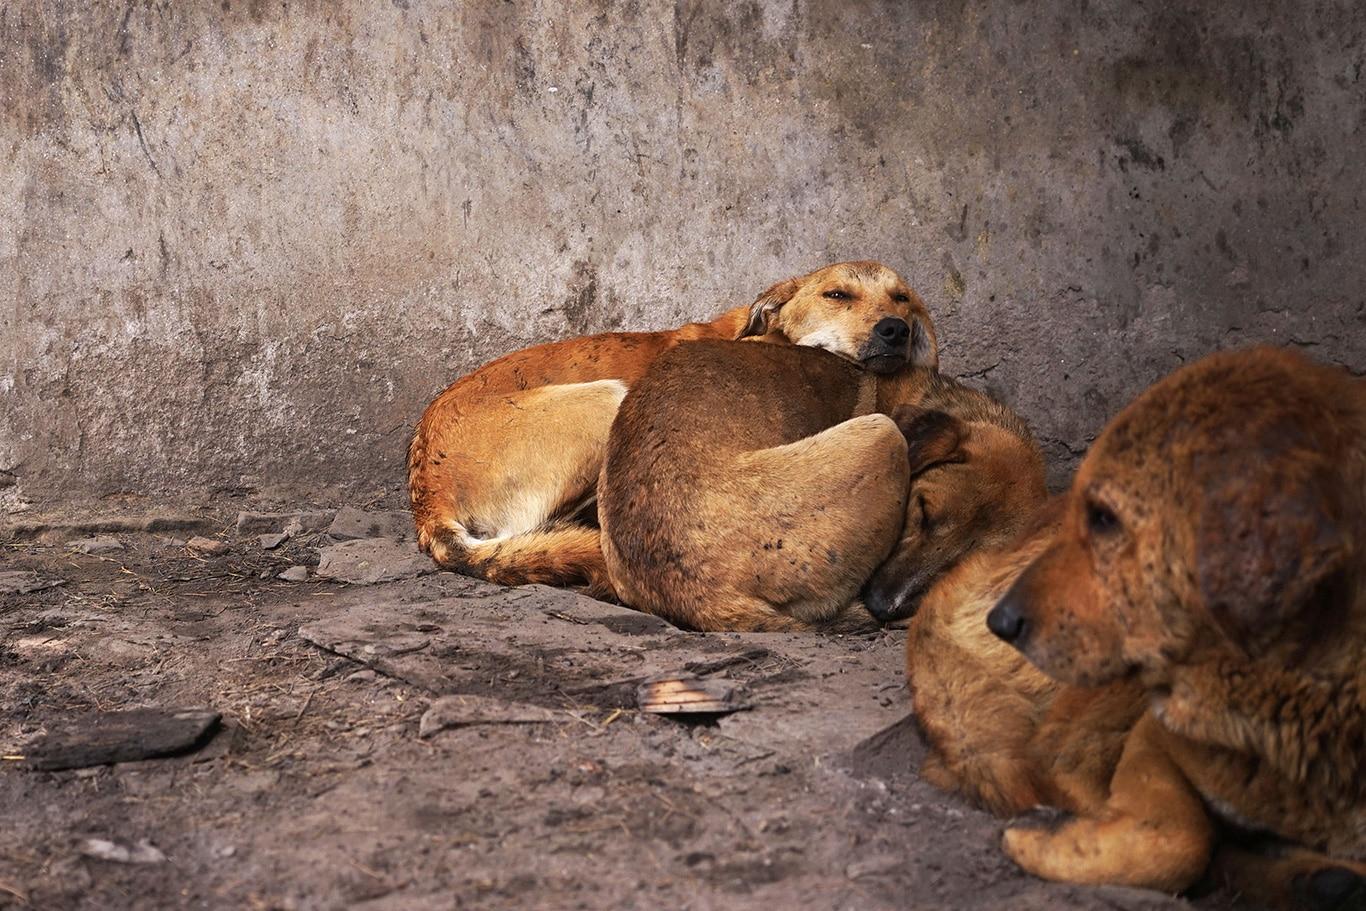 Cassandra and her six defenseless puppies DESPERATELY need help! 1